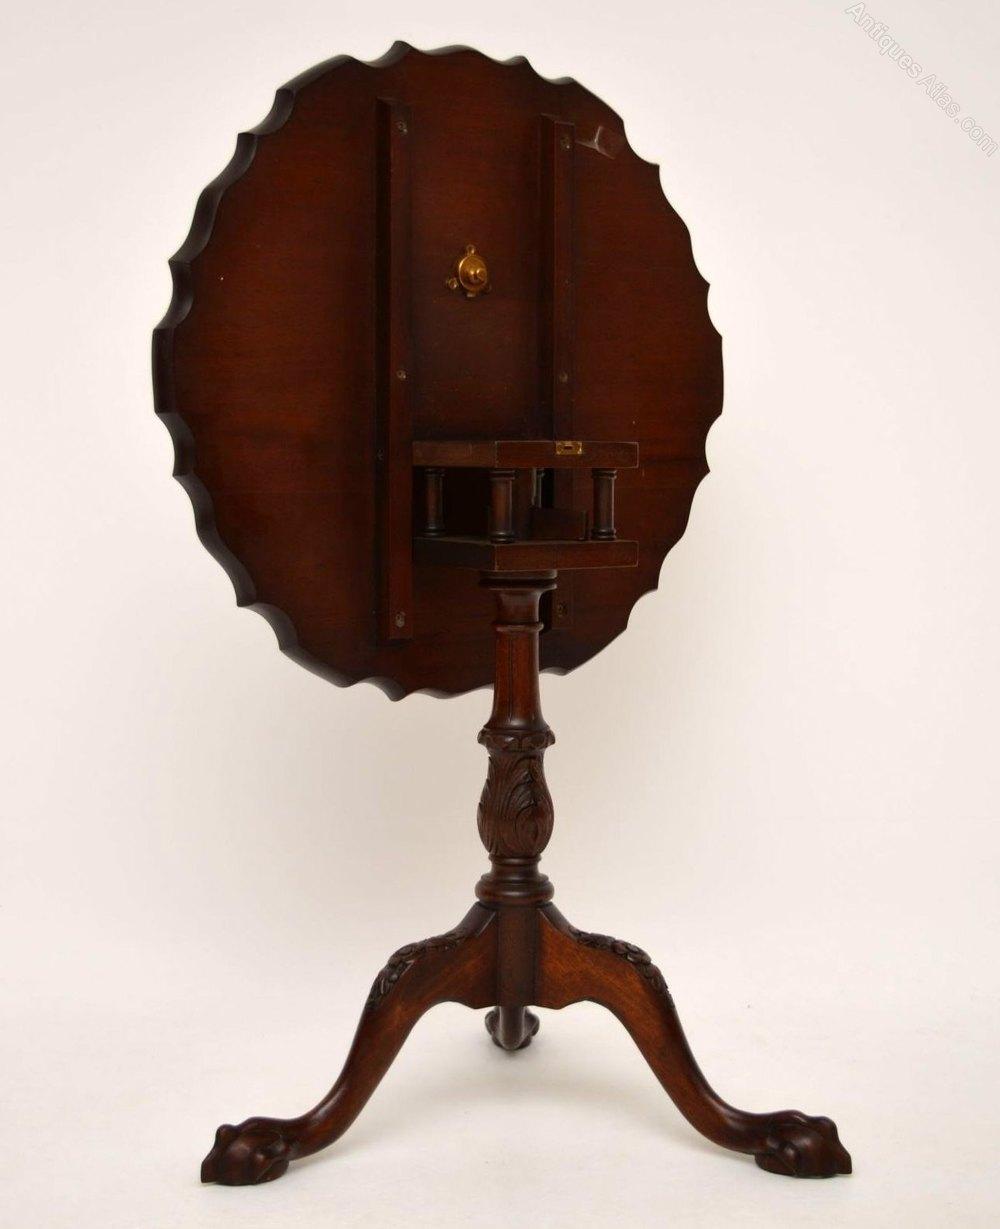 Antique Mahogany Tilt Top Pie Crust Table Antiques Atlas